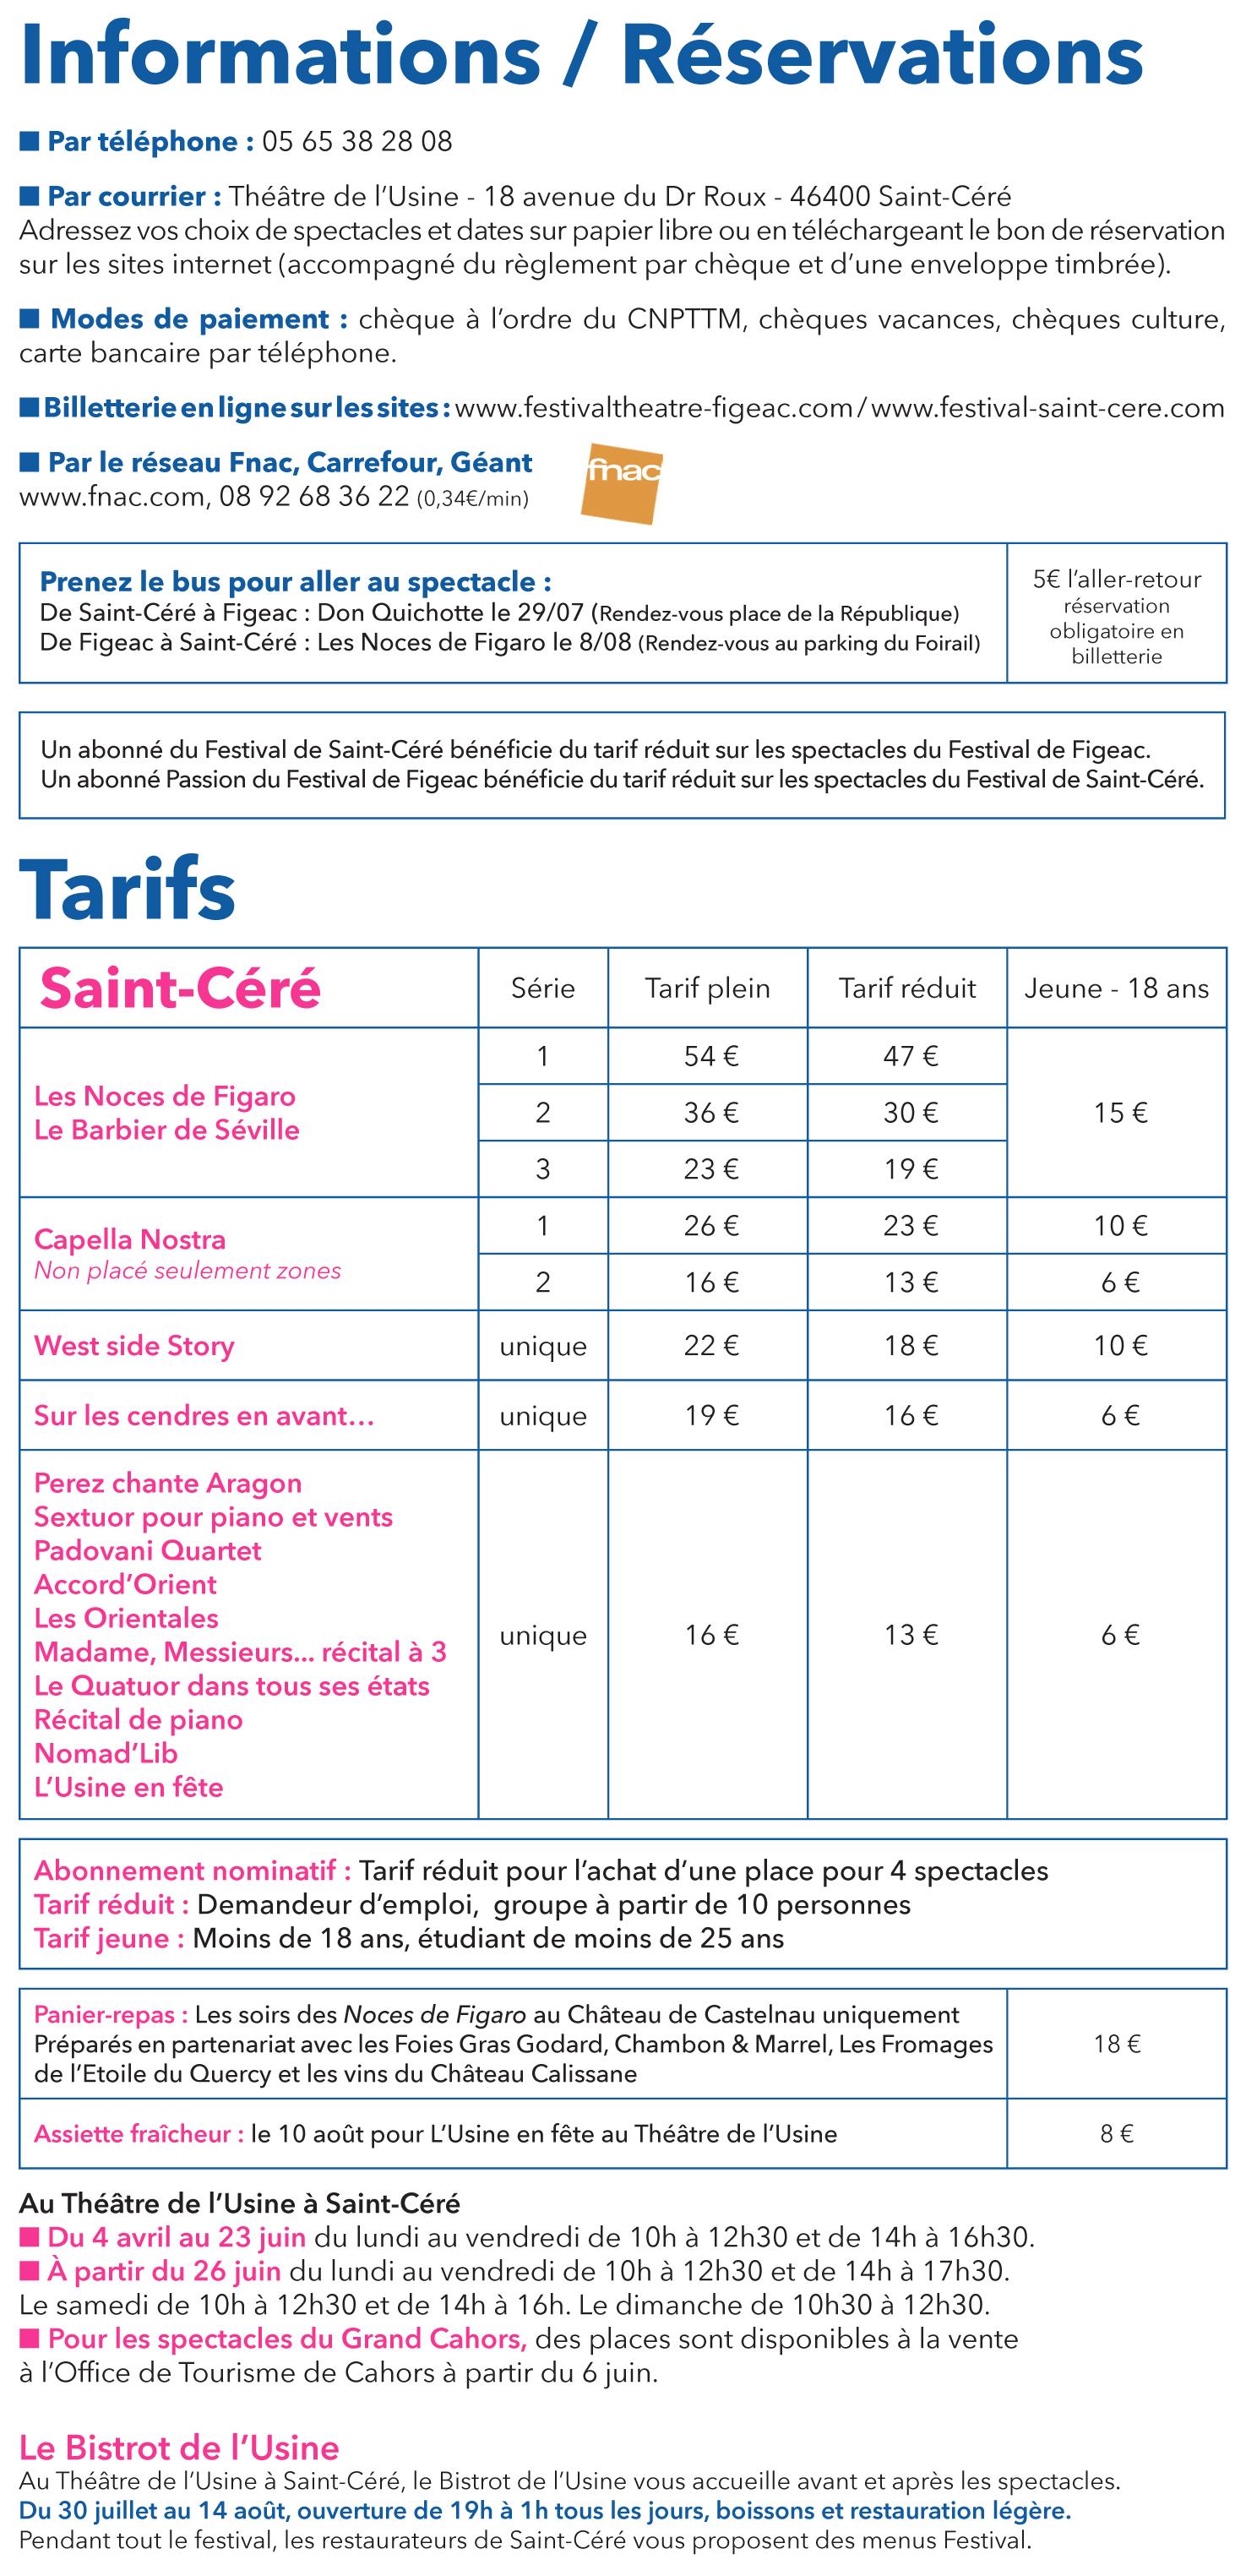 Page info et tarifs